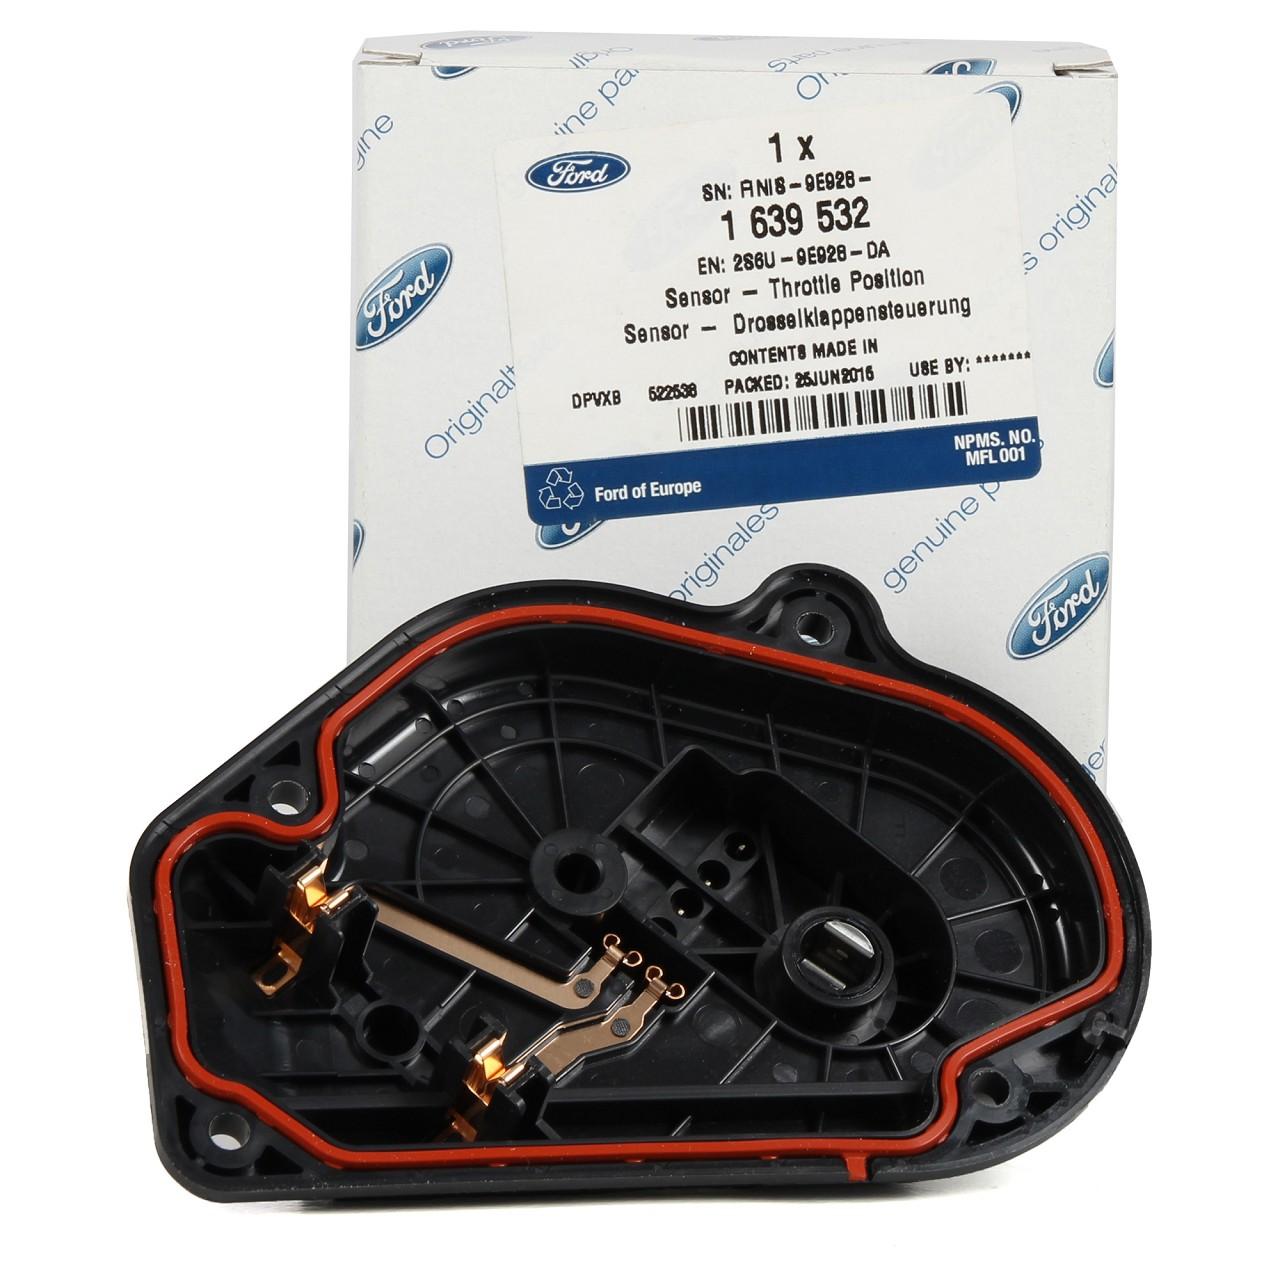 ORIGINAL Ford Drosselklappensensor 1639532 für C-MAX FIESTA 5 6 FOCUS 2 3